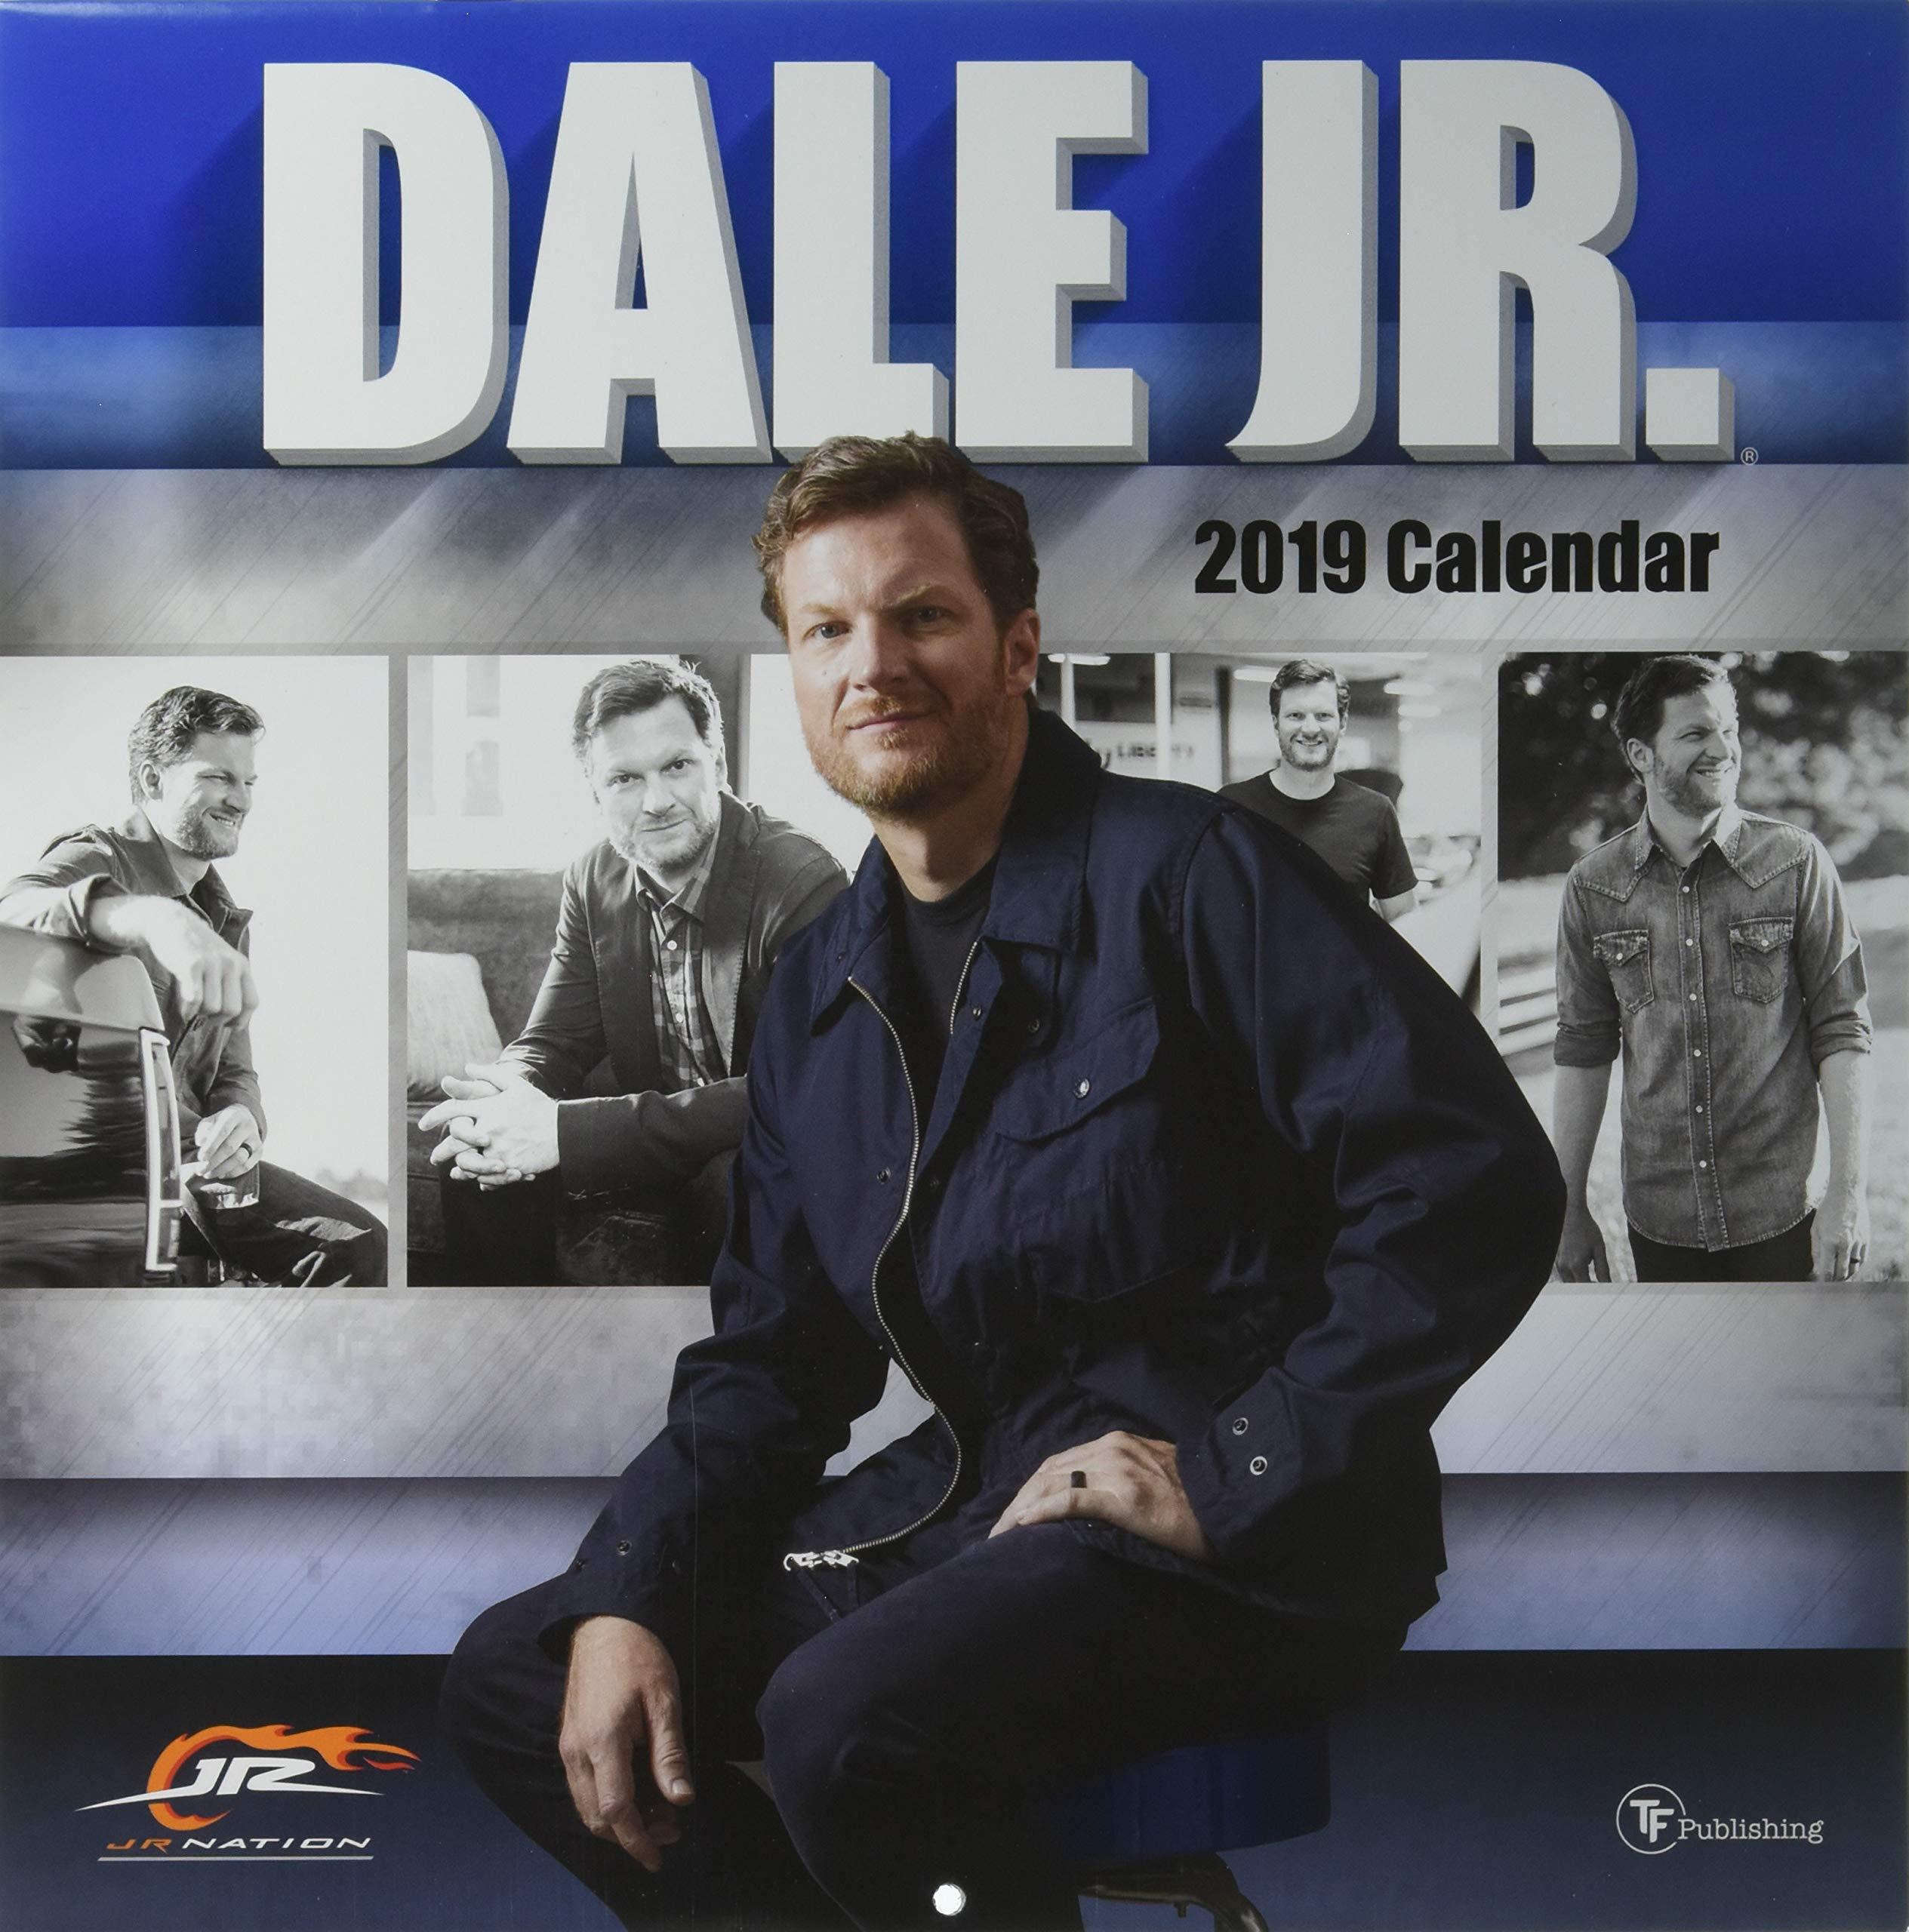 6a951bedfb37a8 Dale Earnhardt Jr 2019 Wall Calendar (12